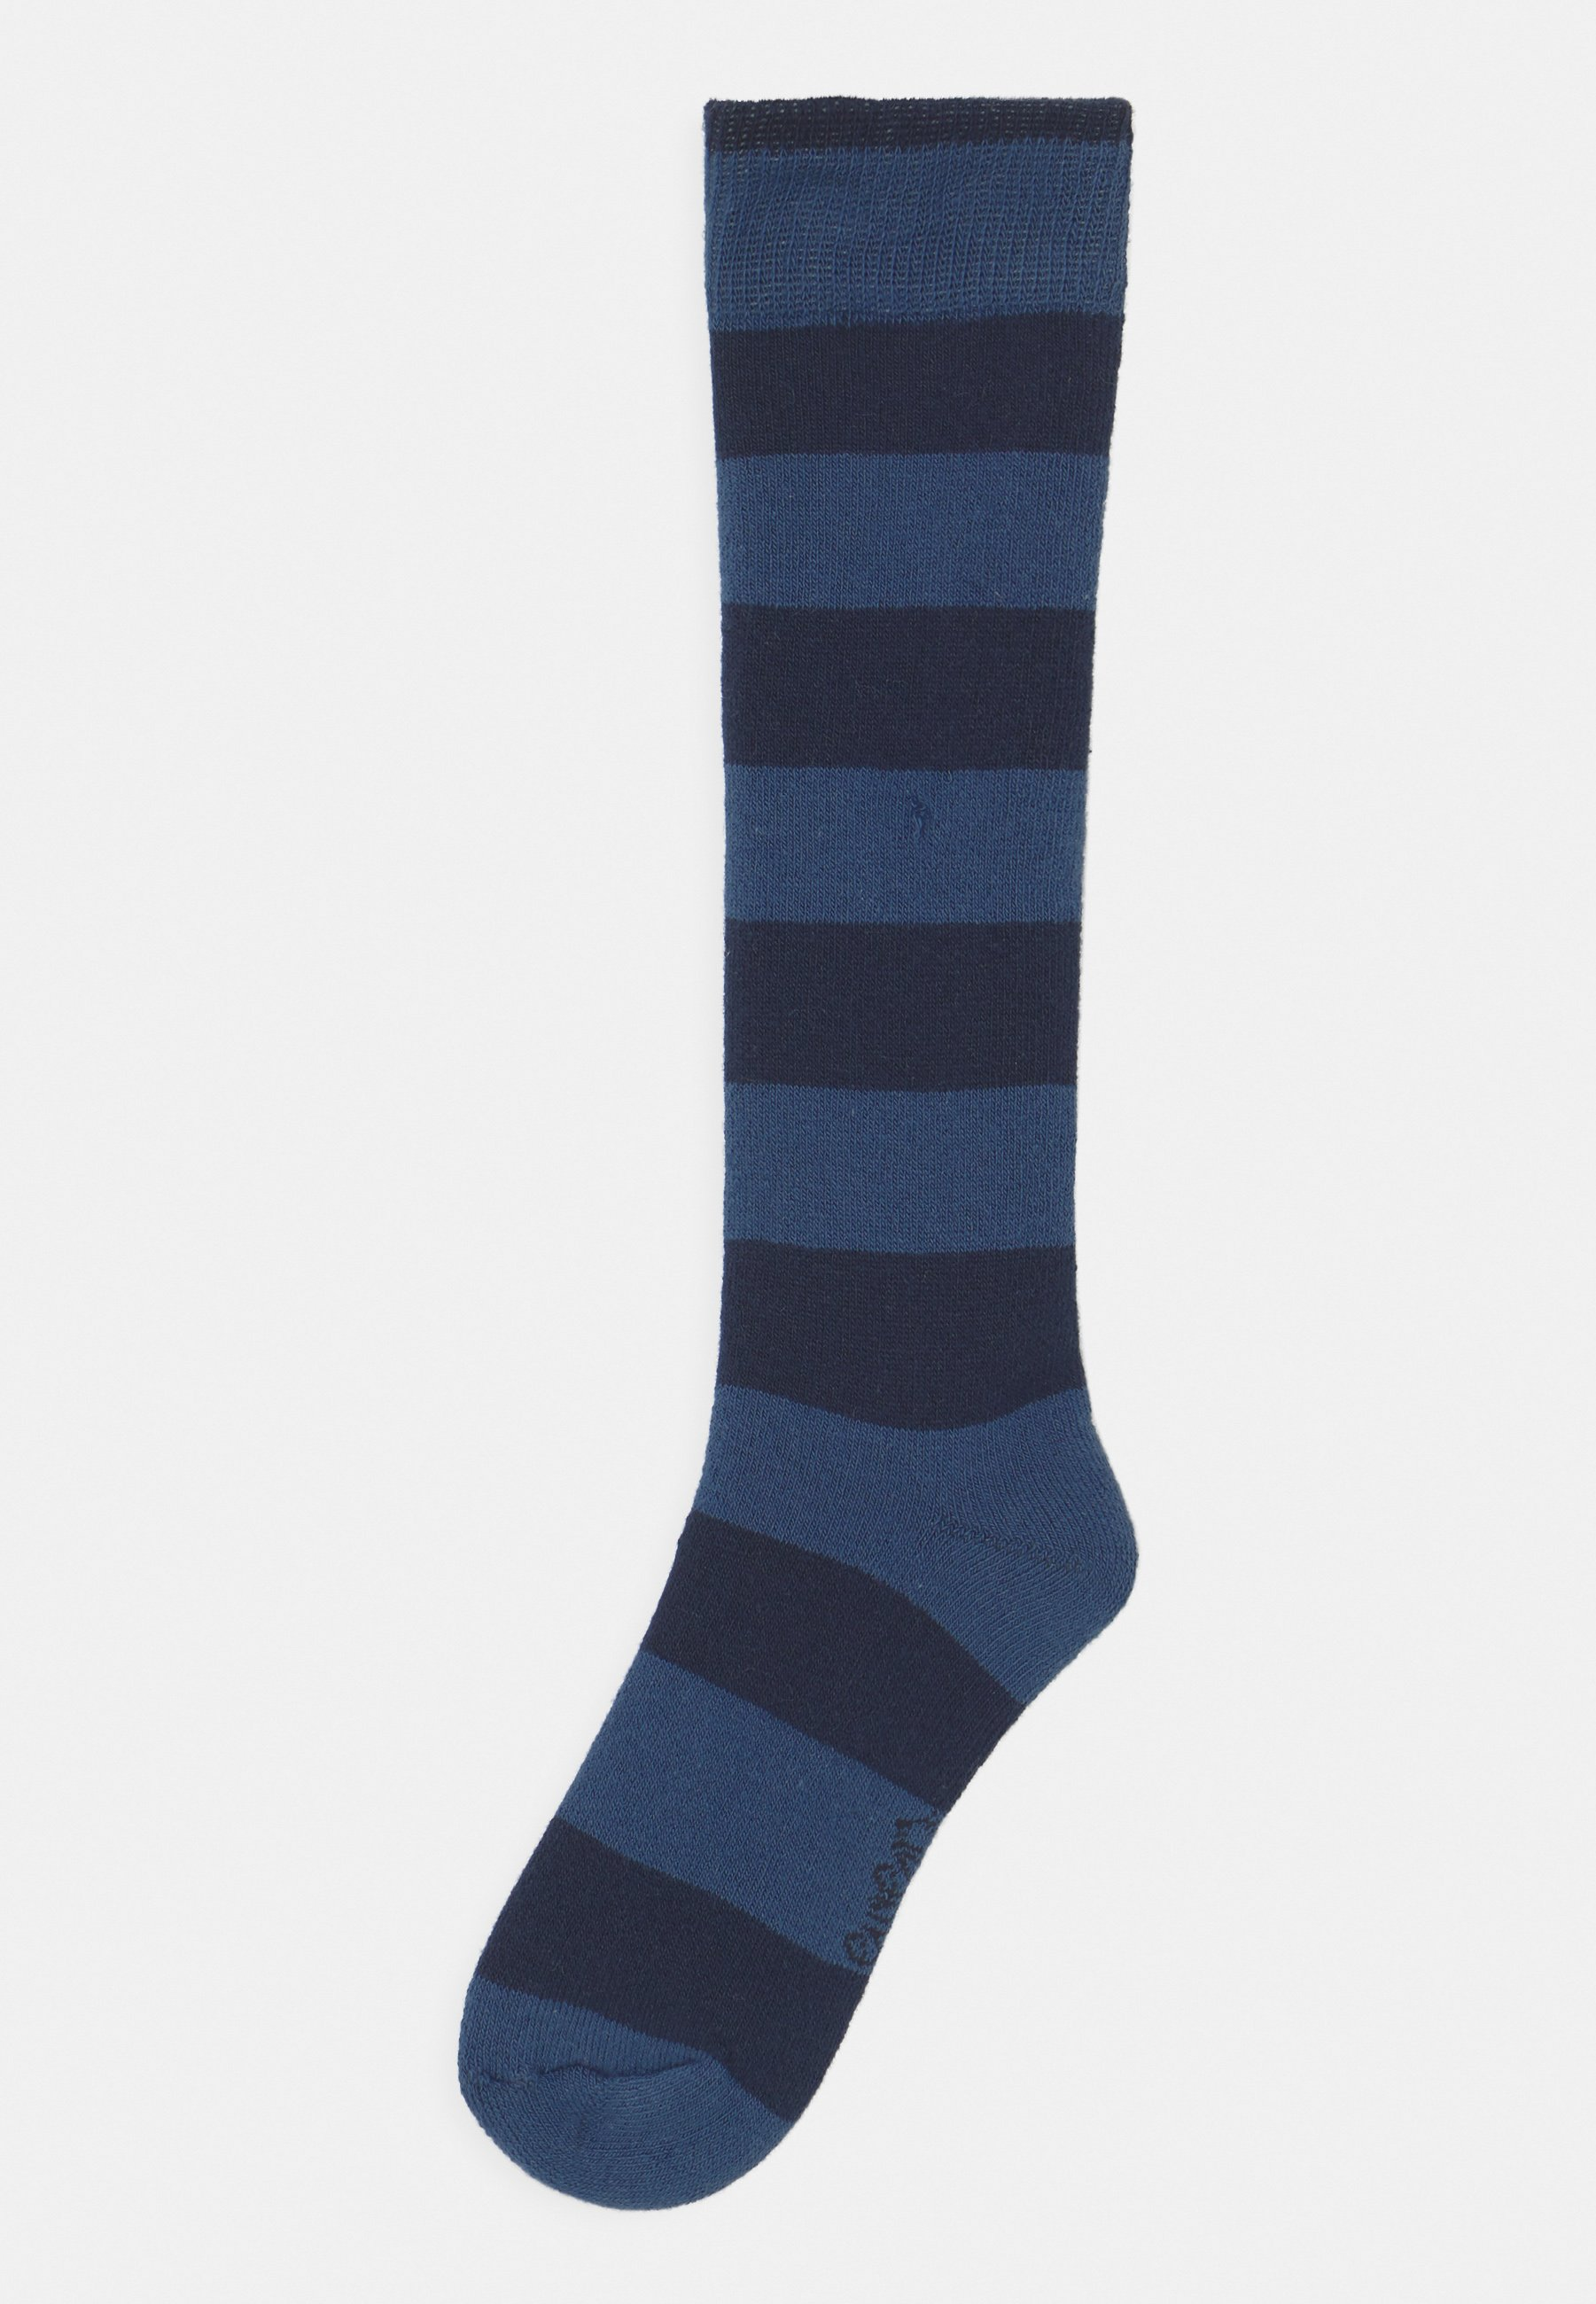 Kids THERMO RINGEL 2 PACK UNISEX - Knee high socks